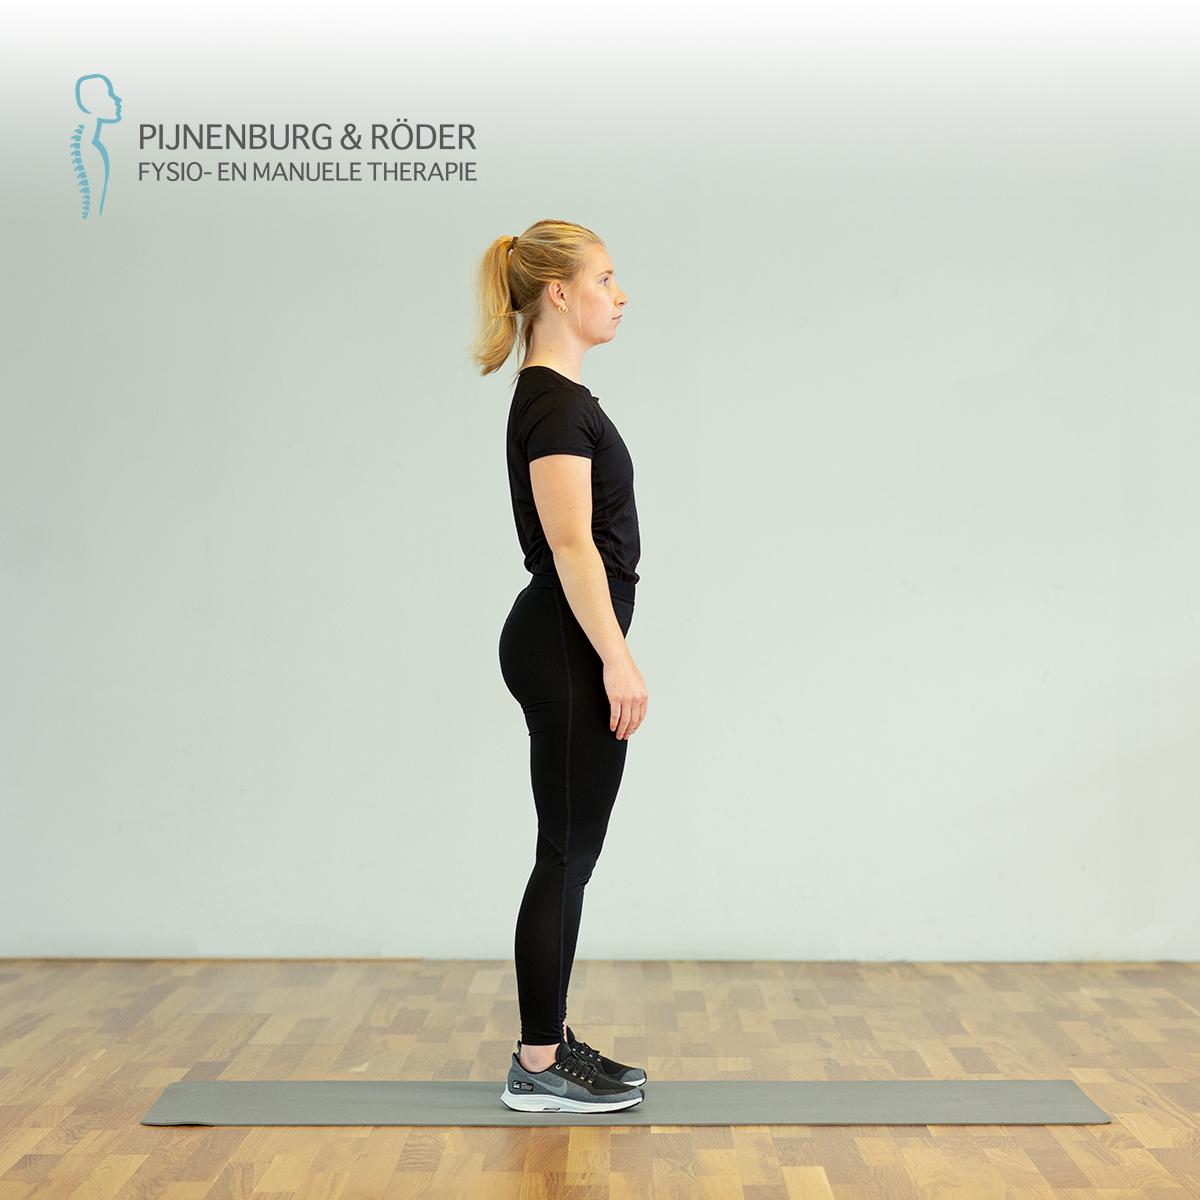 kracht oefening knie squat